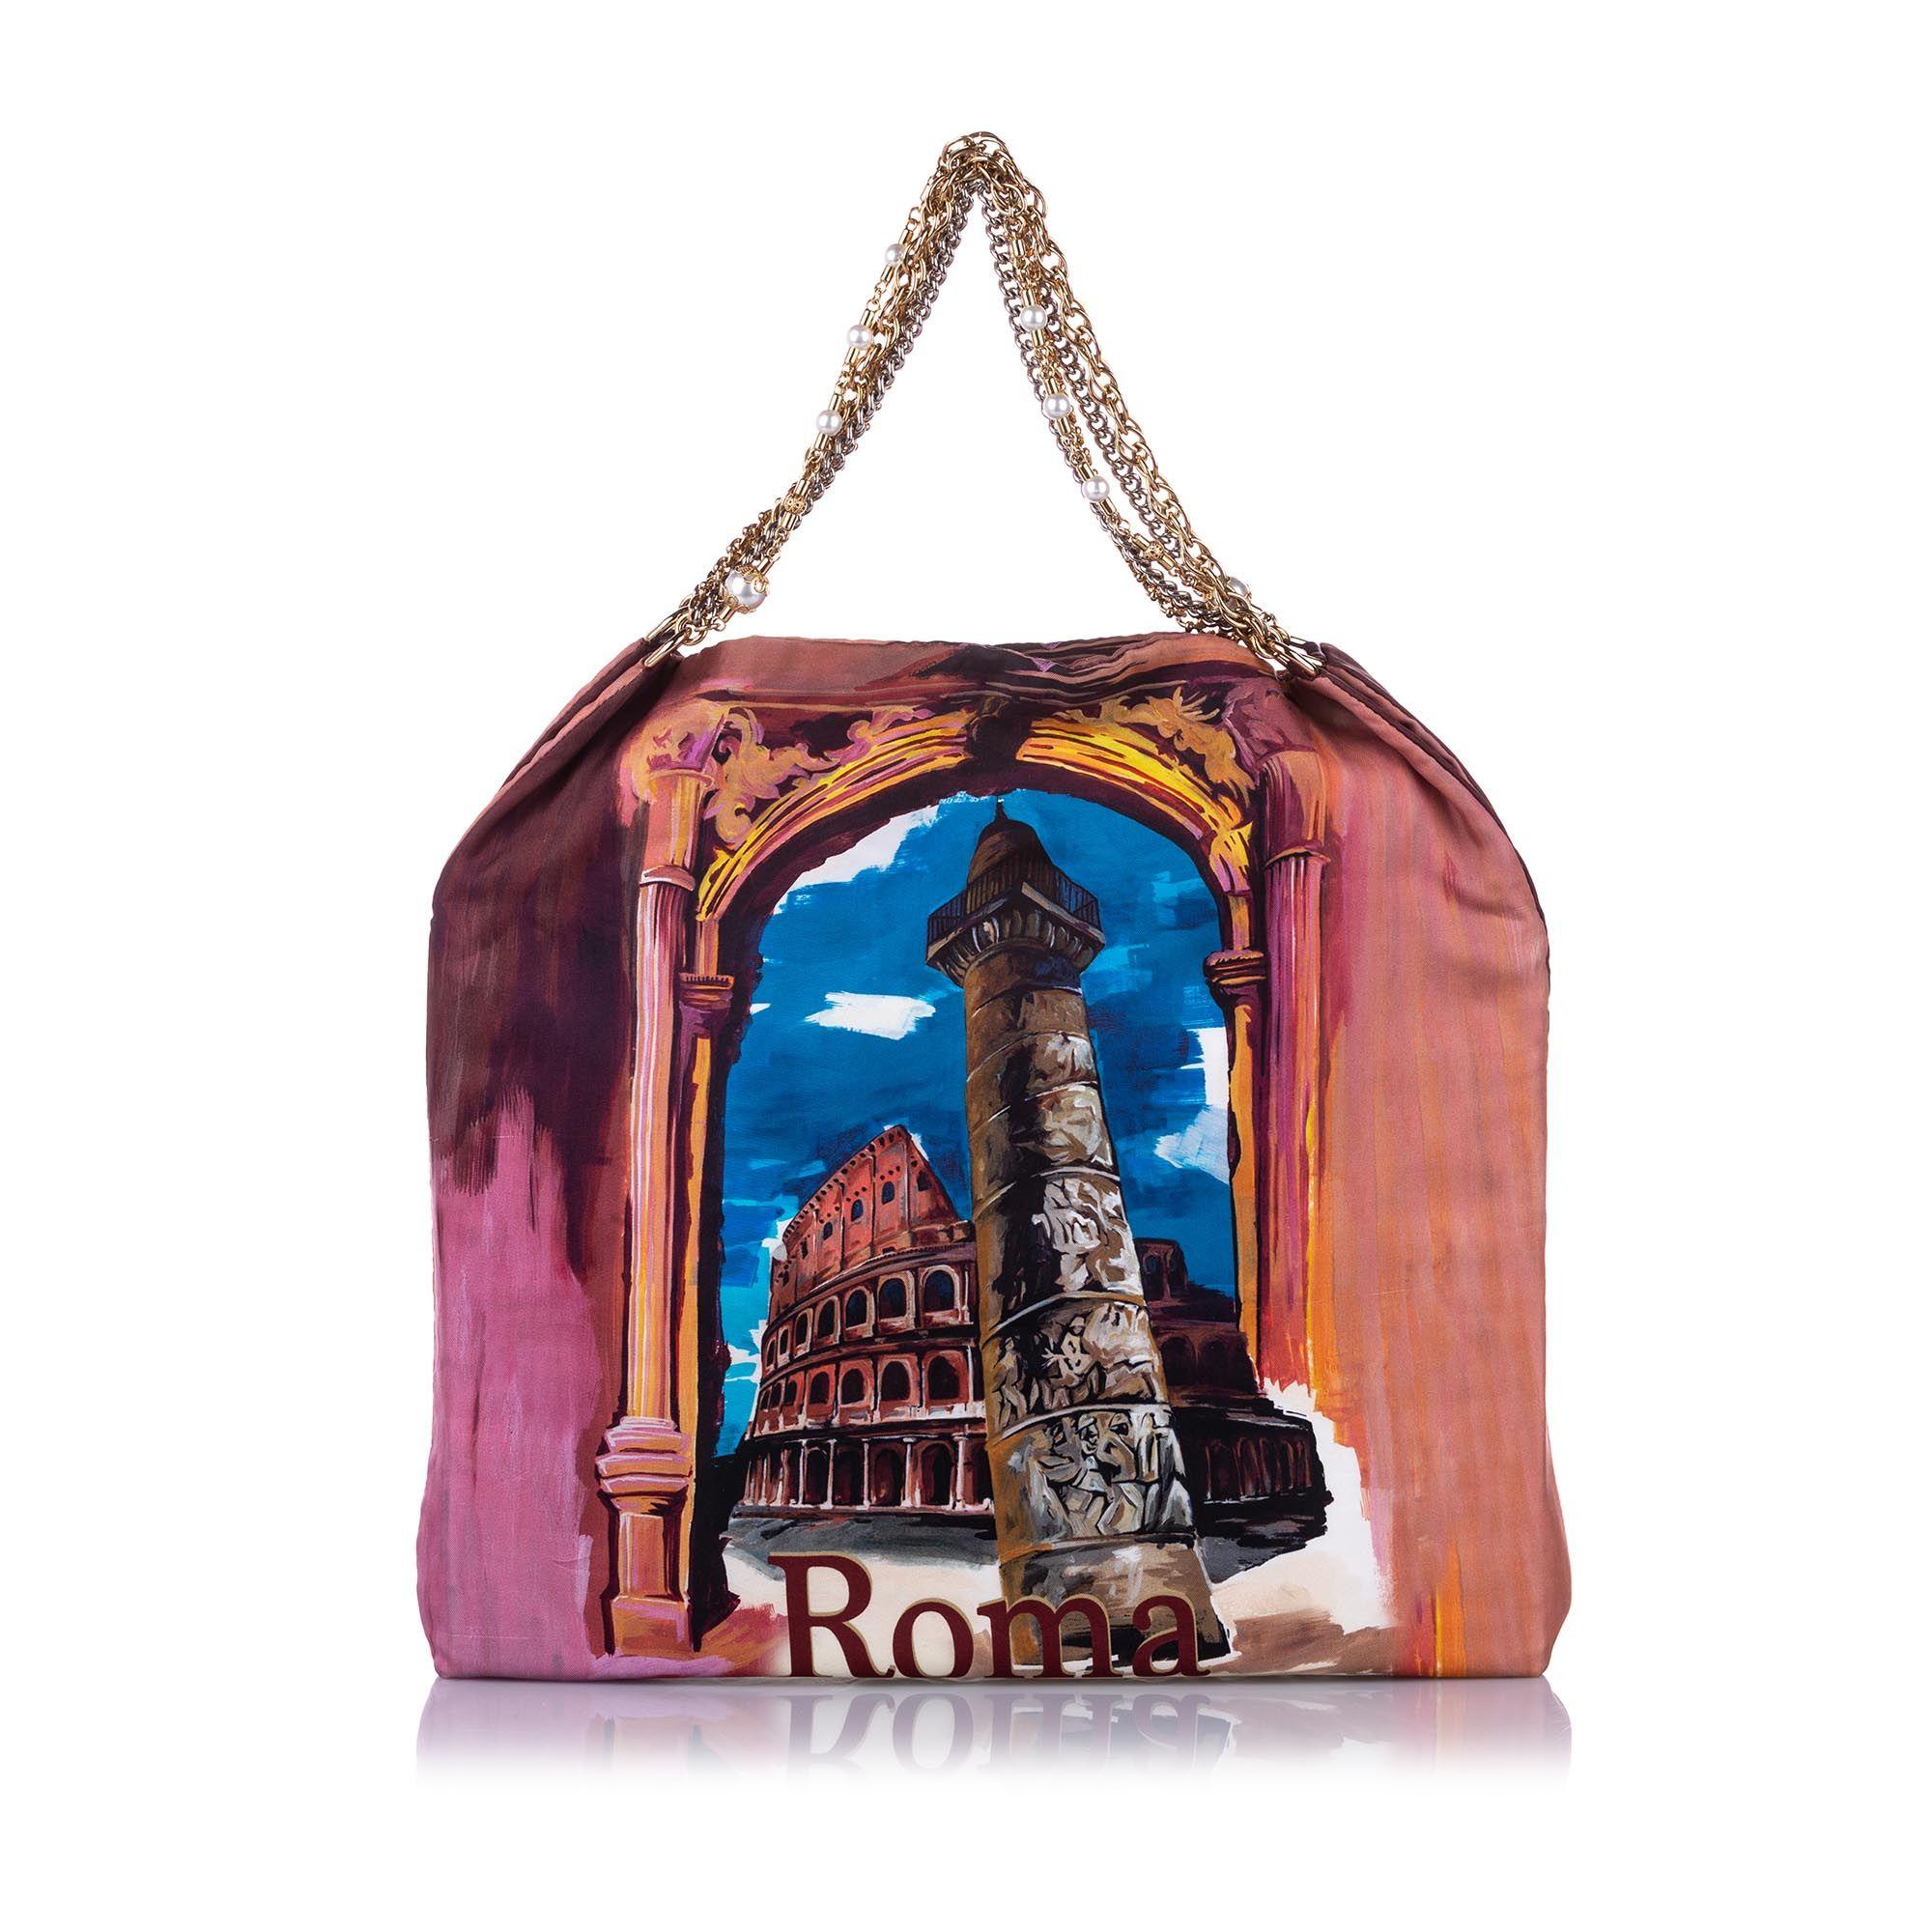 Vintage Dolce&Gabbana Anita Roma Printed Silk Tote Bag Multi